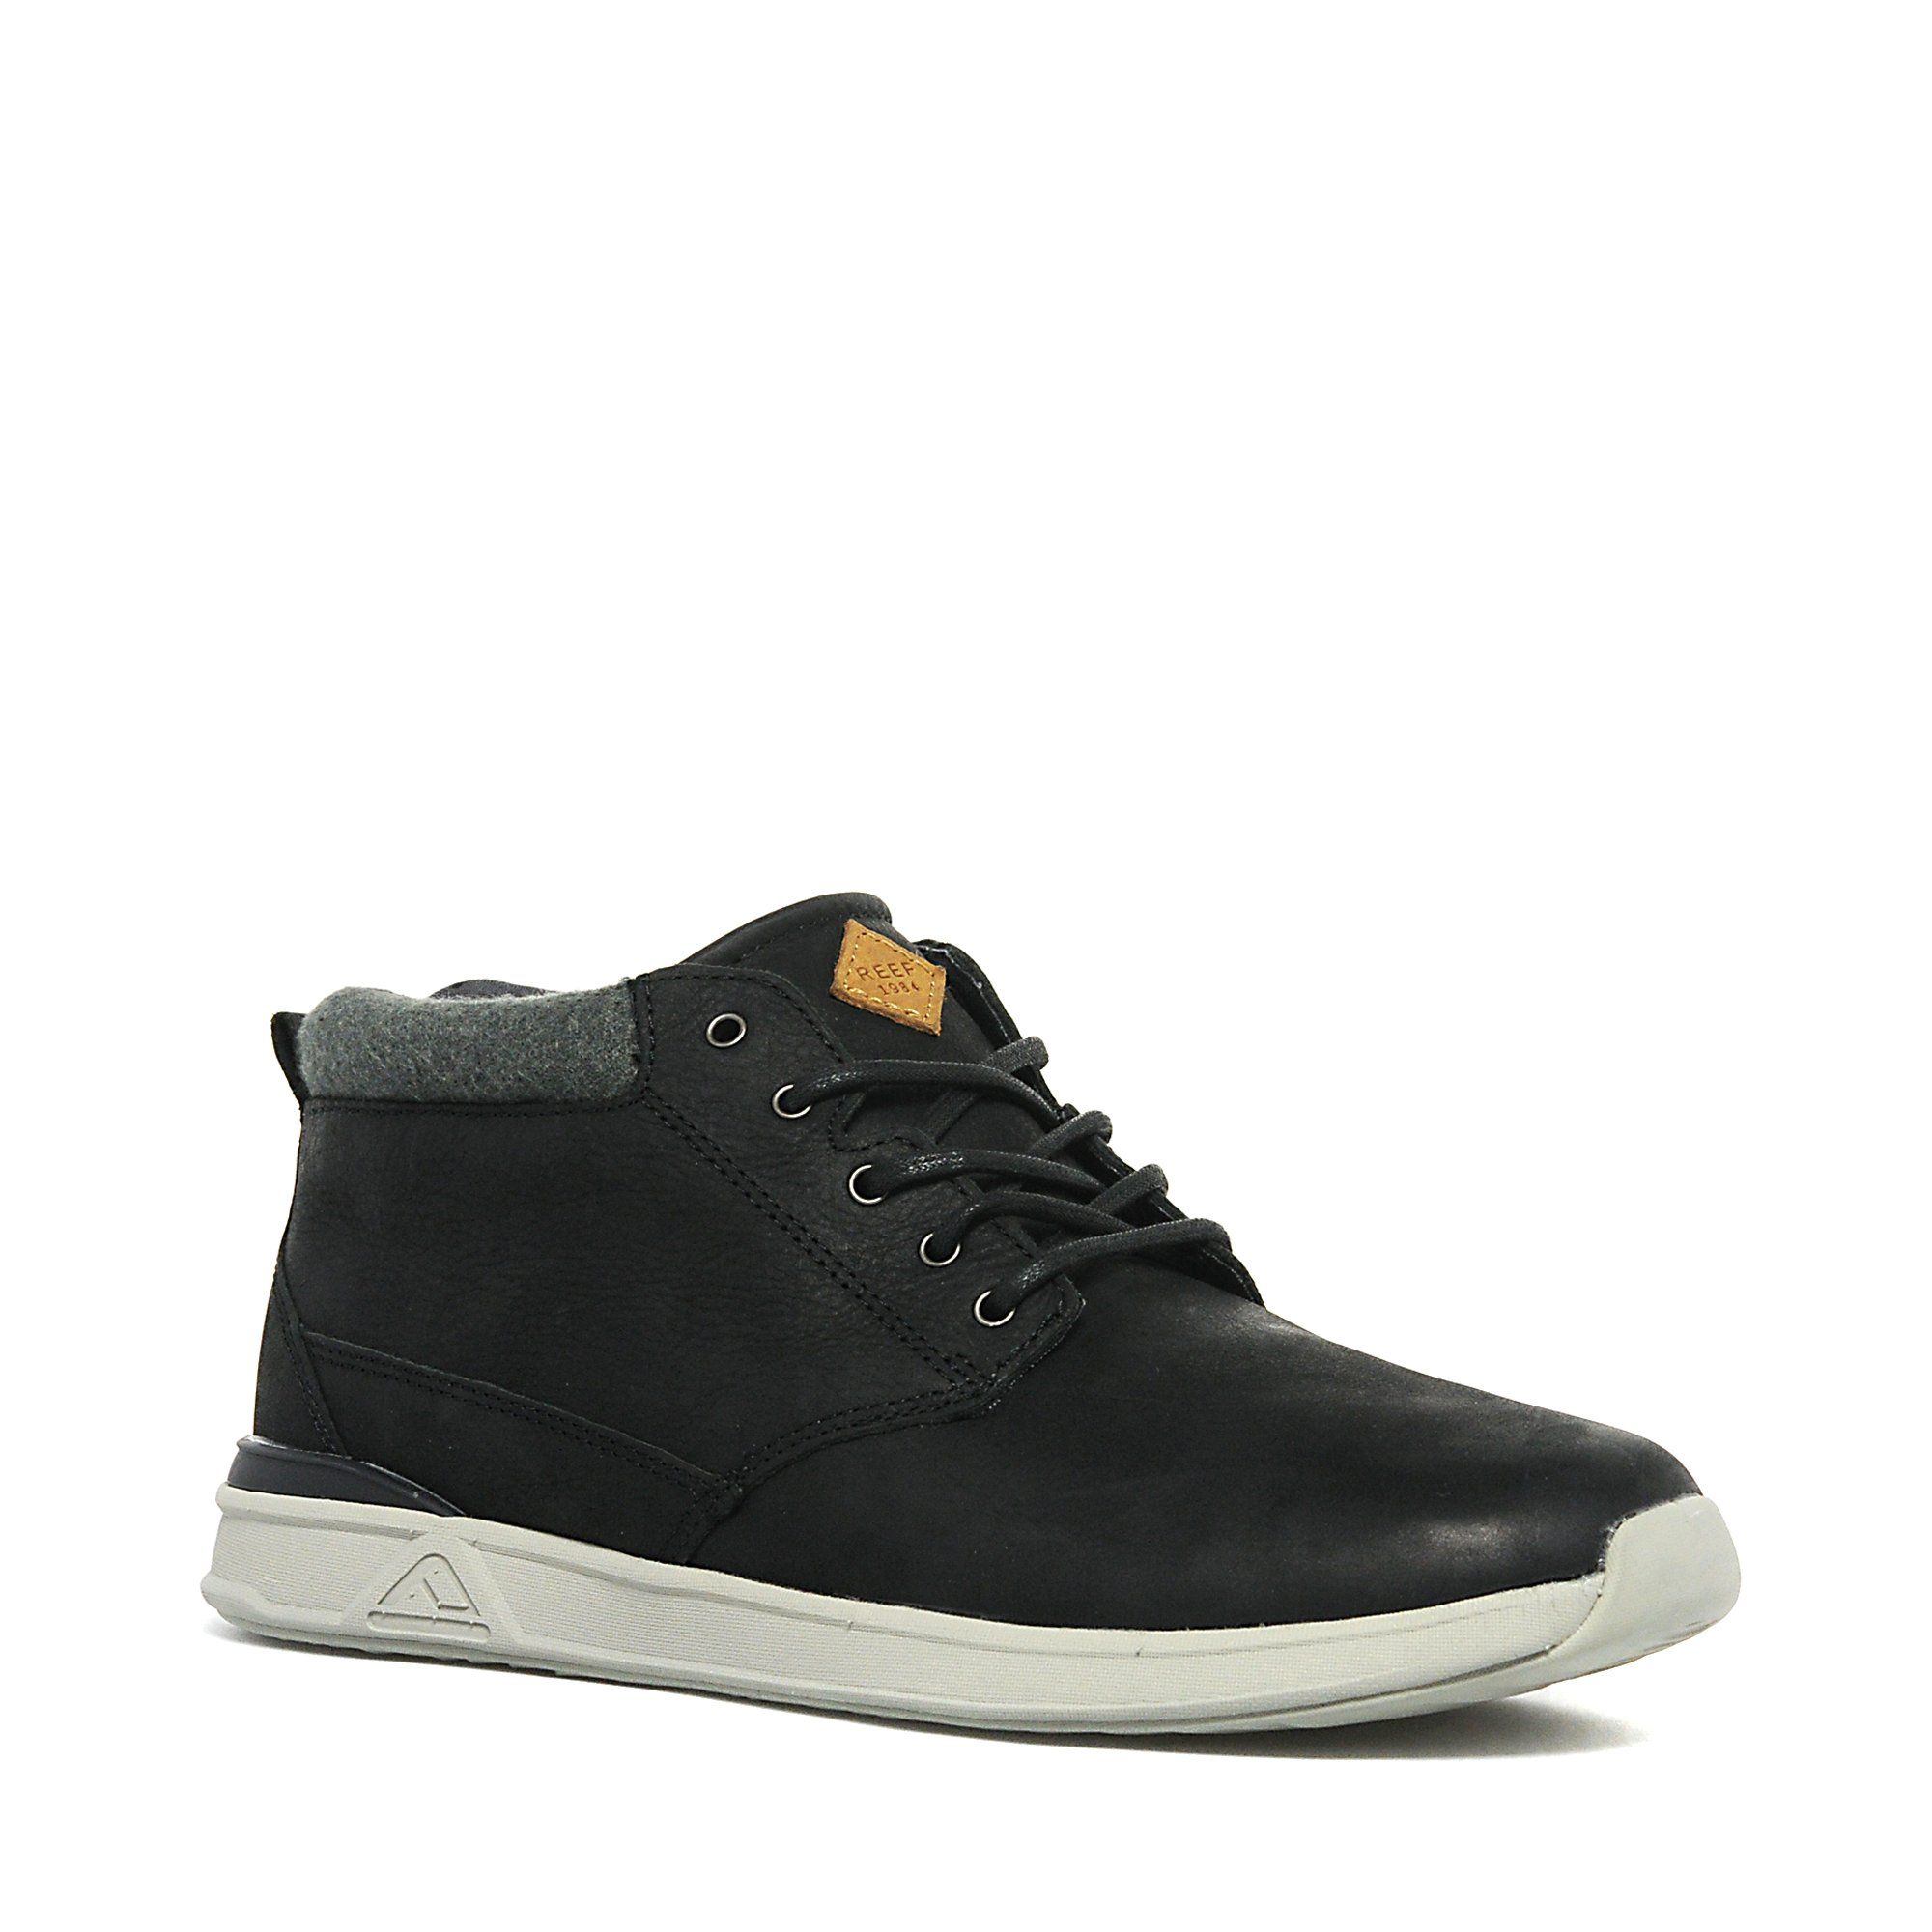 REEF Men's Rover Casual Mid Shoe